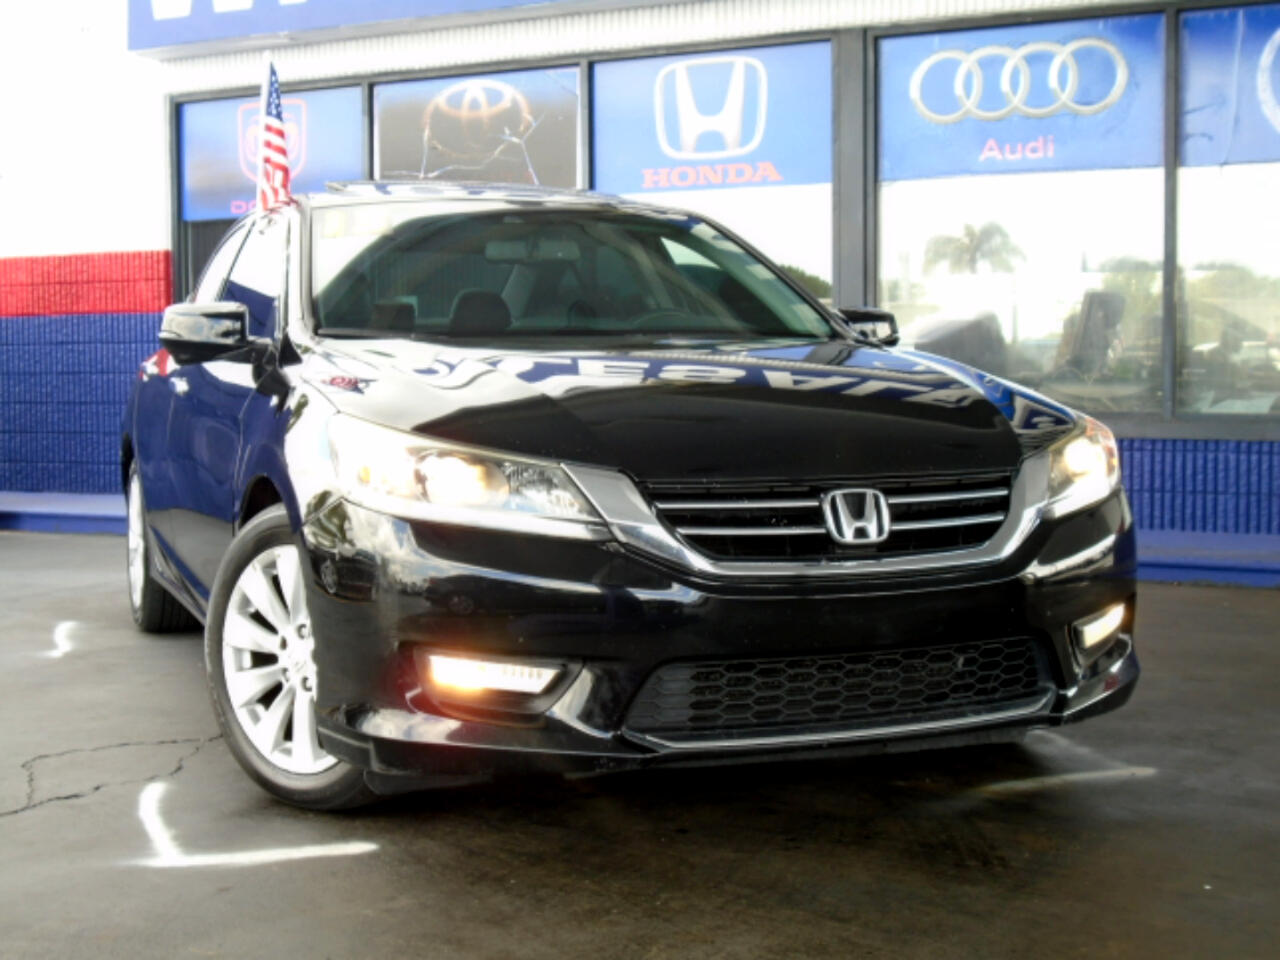 2013 Honda Accord Sdn 4dr V6 Auto EX-L